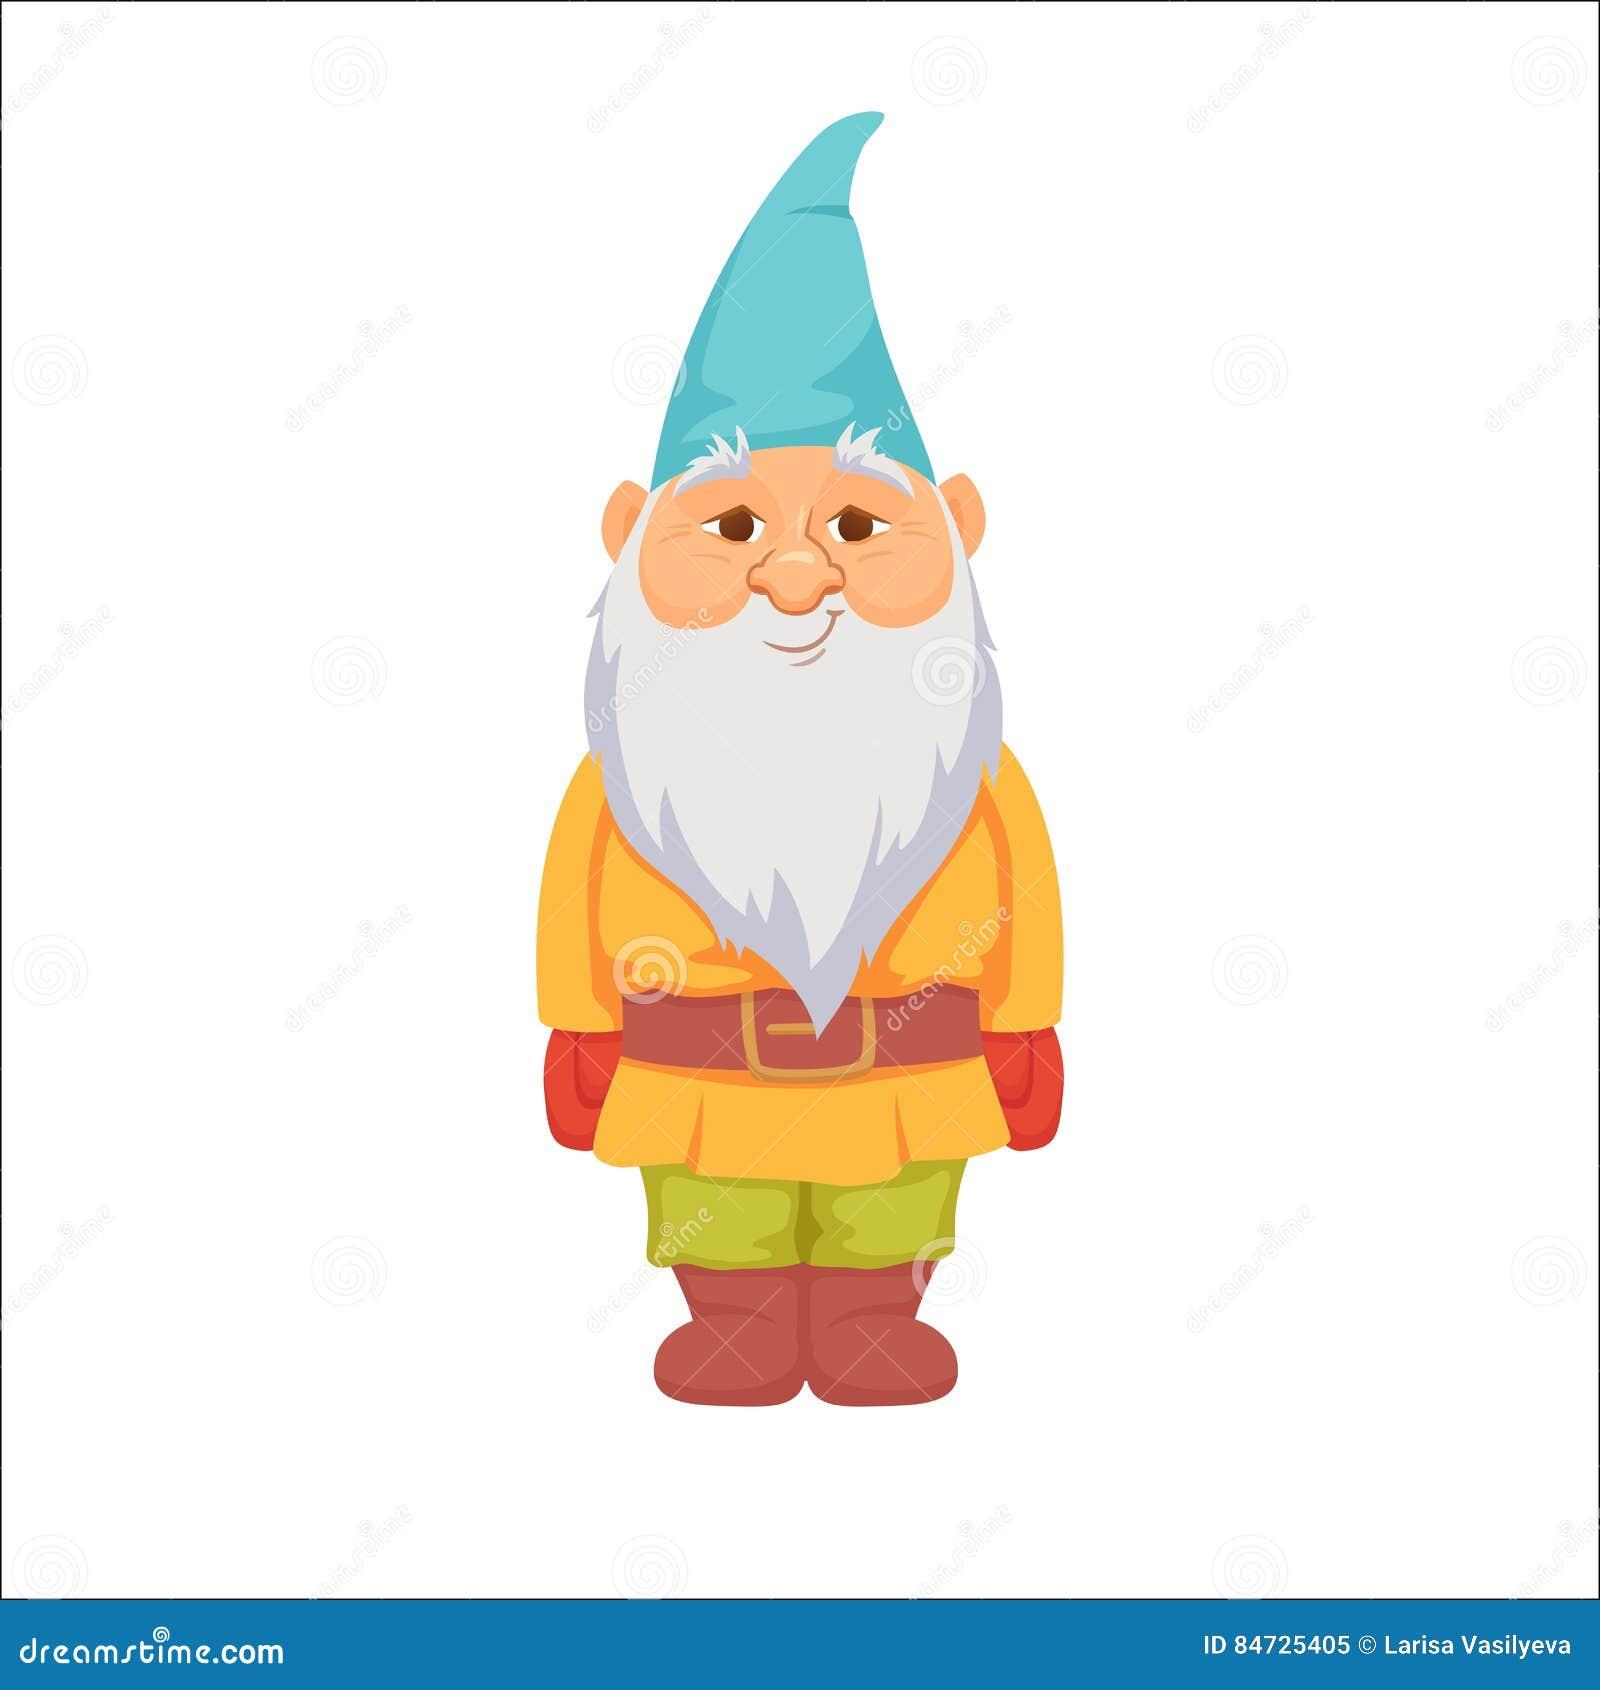 Gnome Clip Art: Gnomes. Funny Dwarf Cartoon Vector